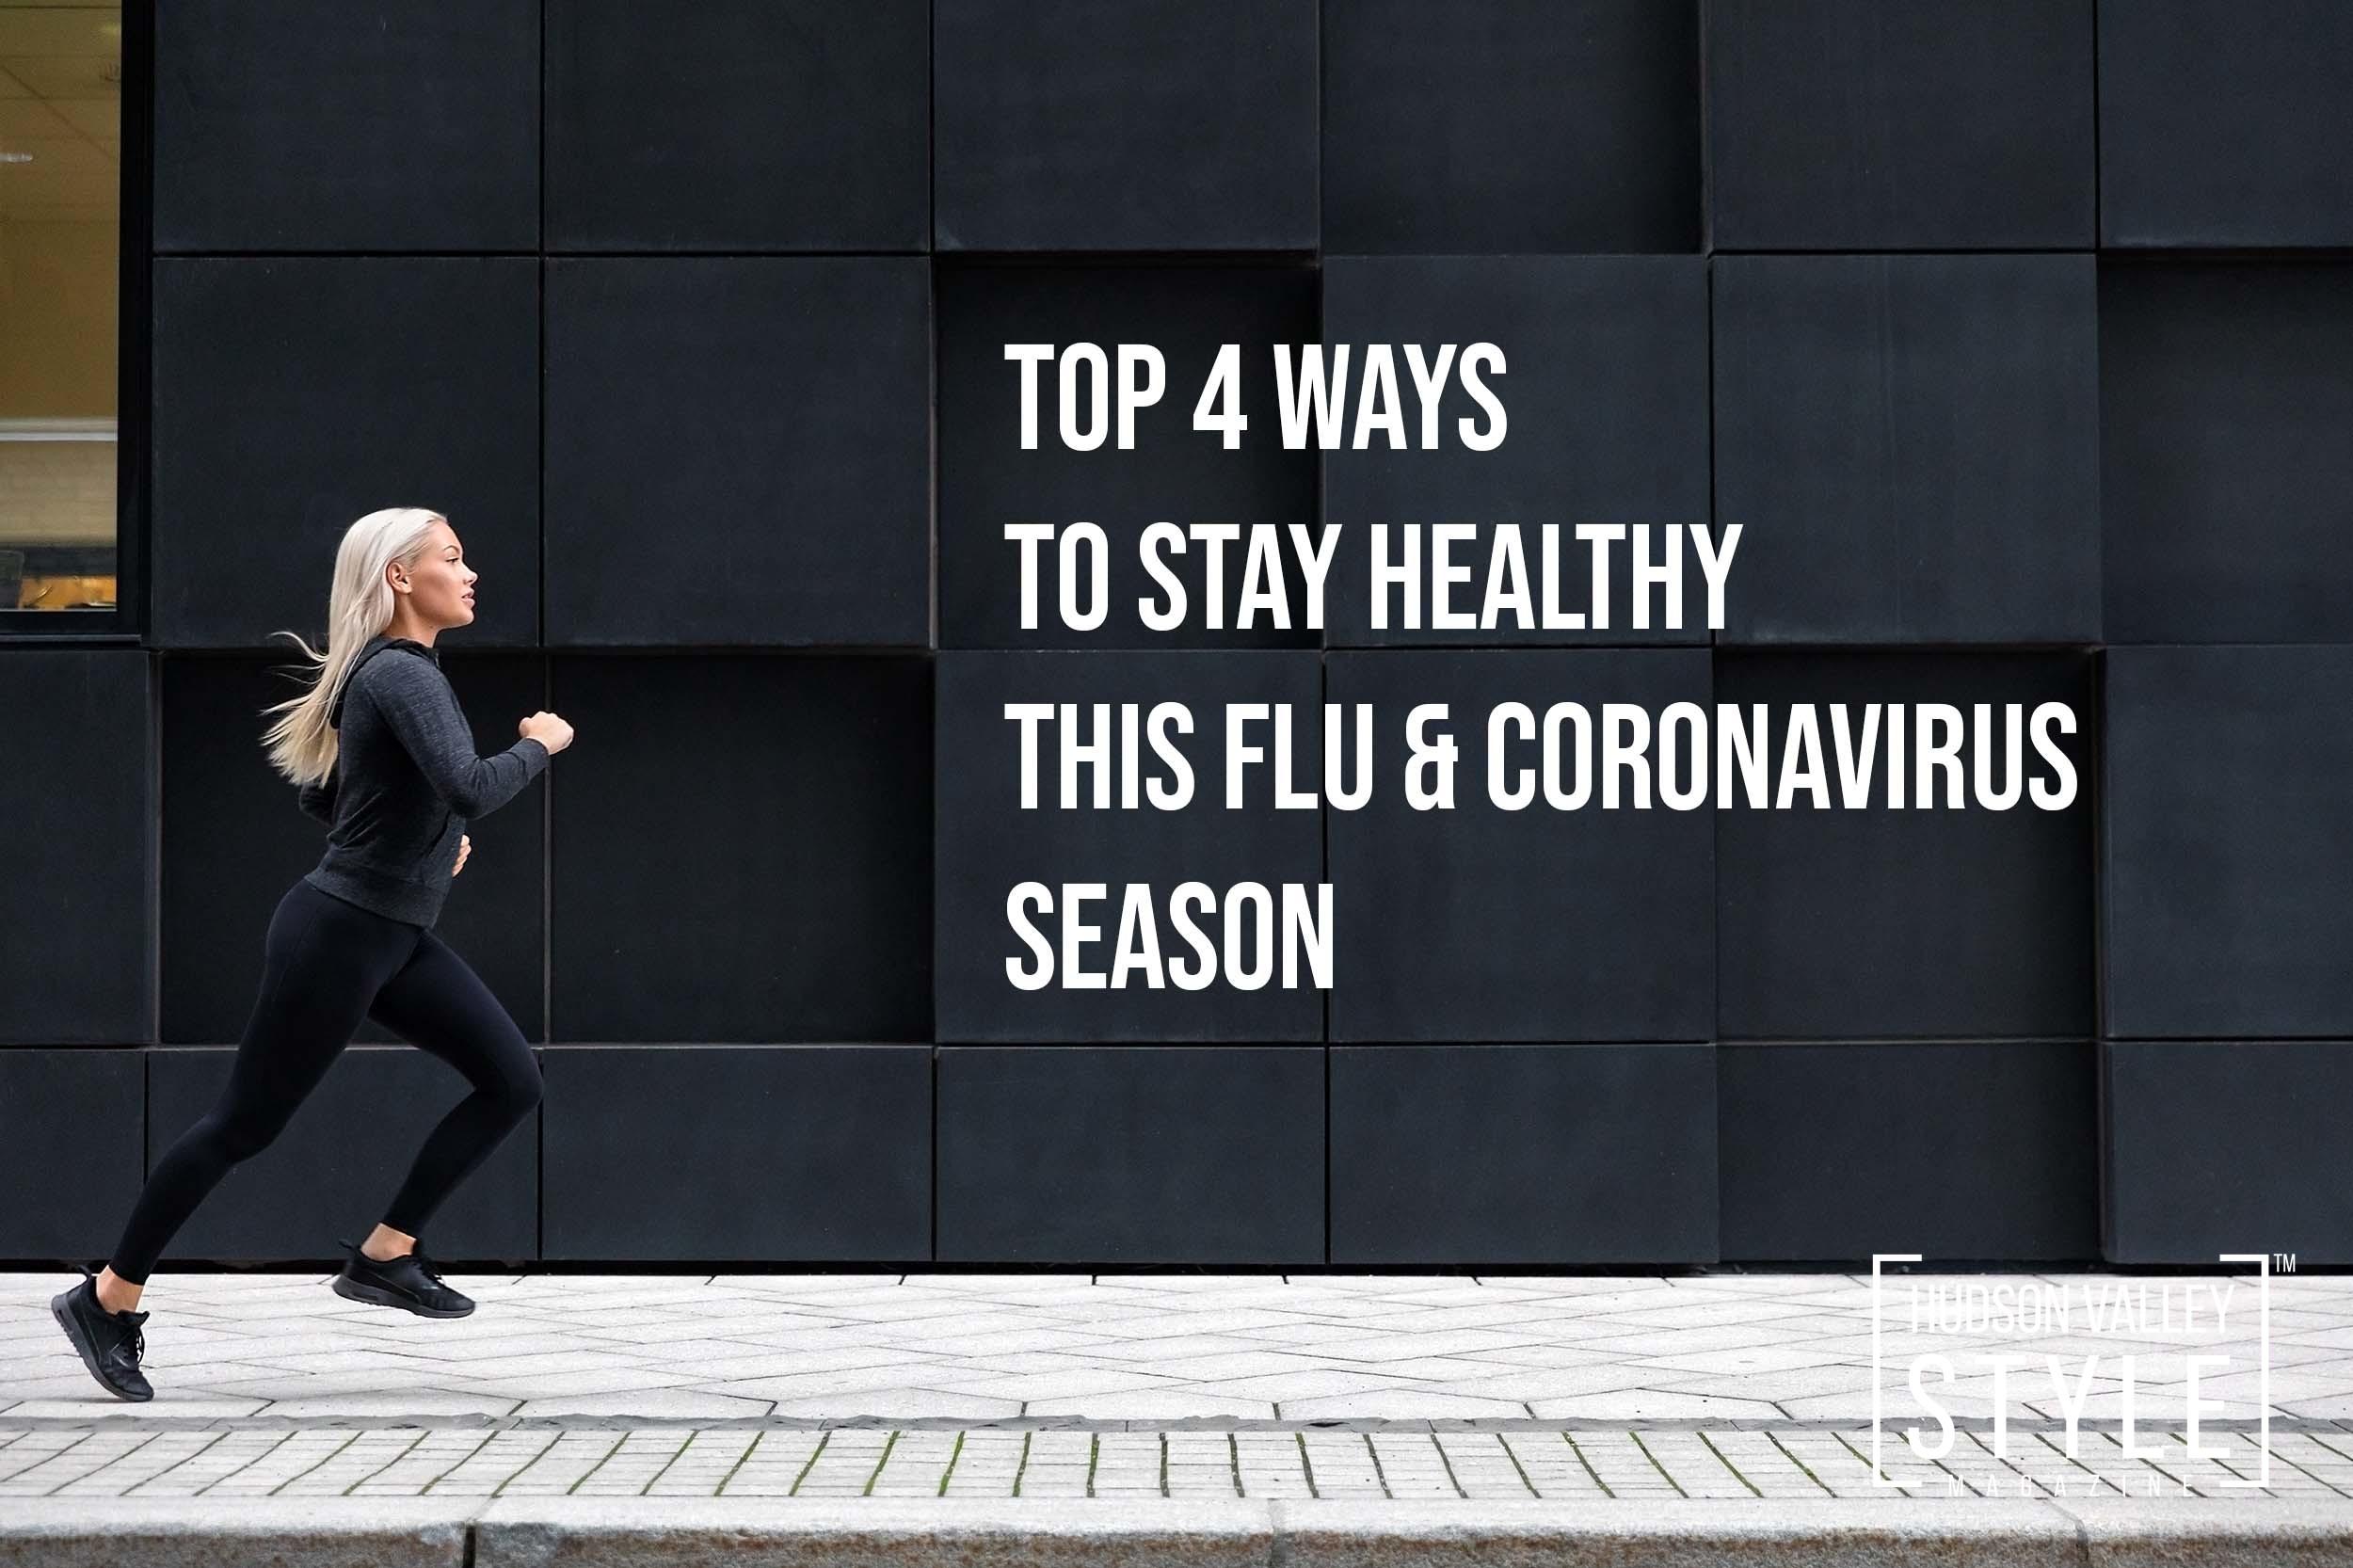 Top 4 Ways to Stay Healthy this Flu and Coronavirus Season